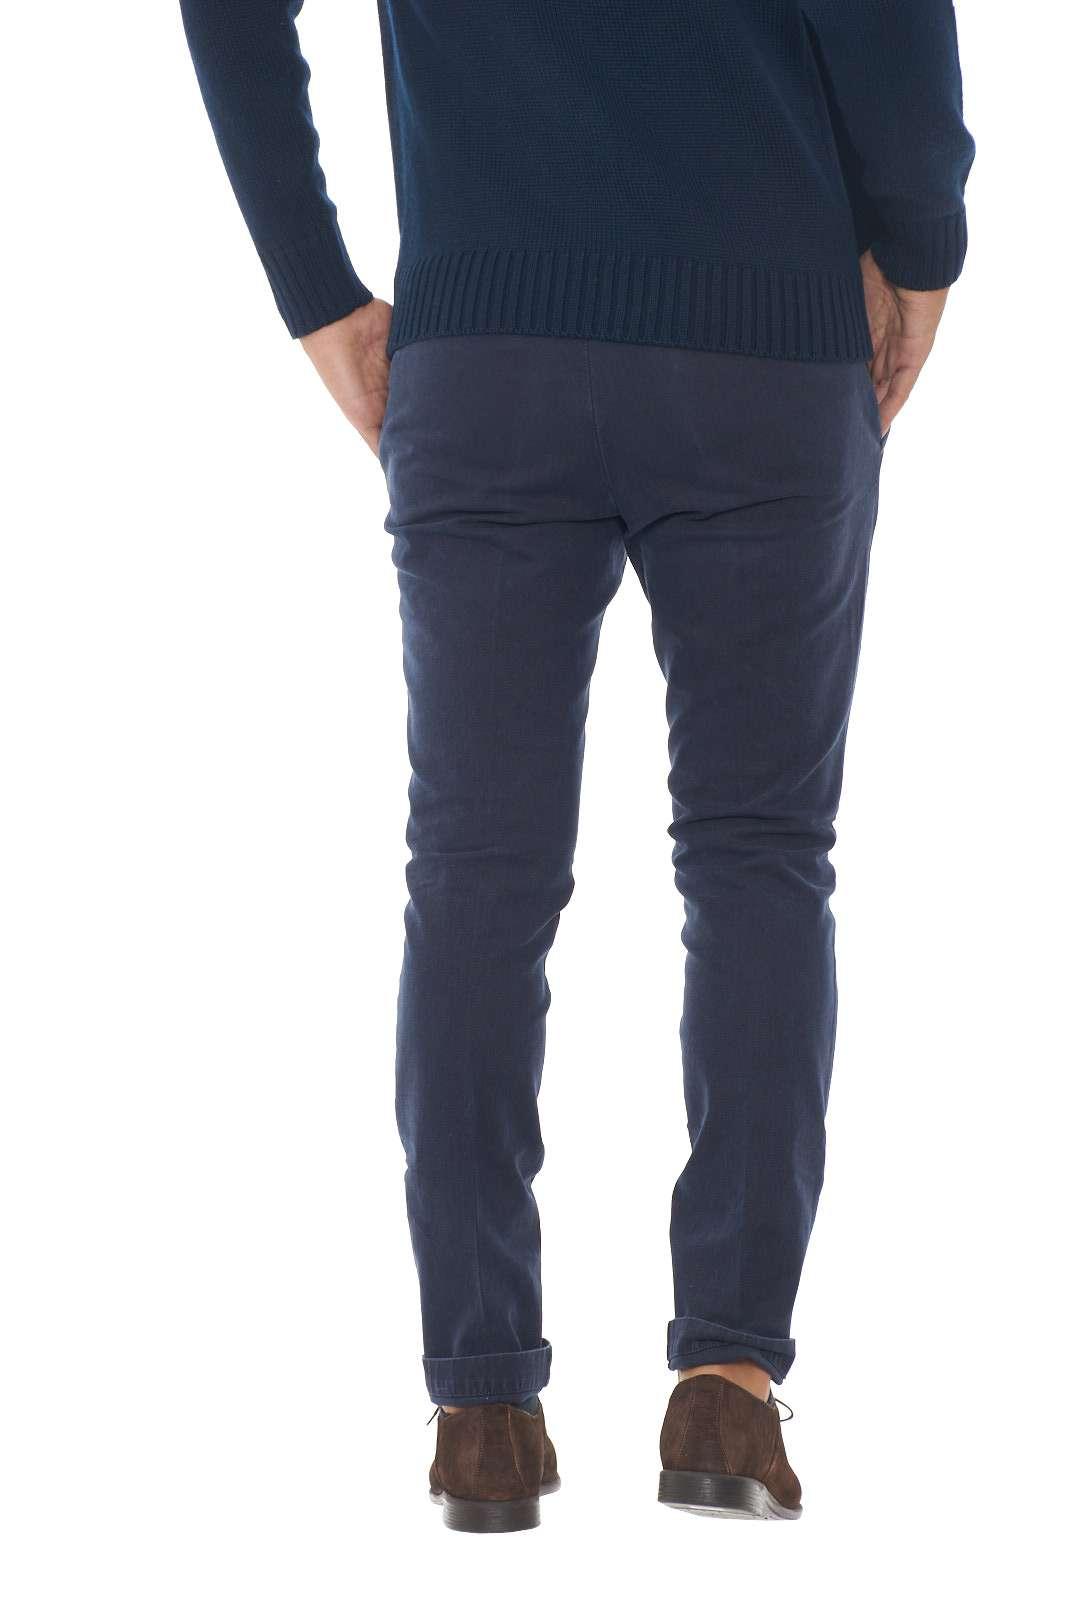 https://www.parmax.com/media/catalog/product/a/i/AI-outlet_parmax-pantaloni-uomo-Michael-Coal-BRAD2443-C.jpg